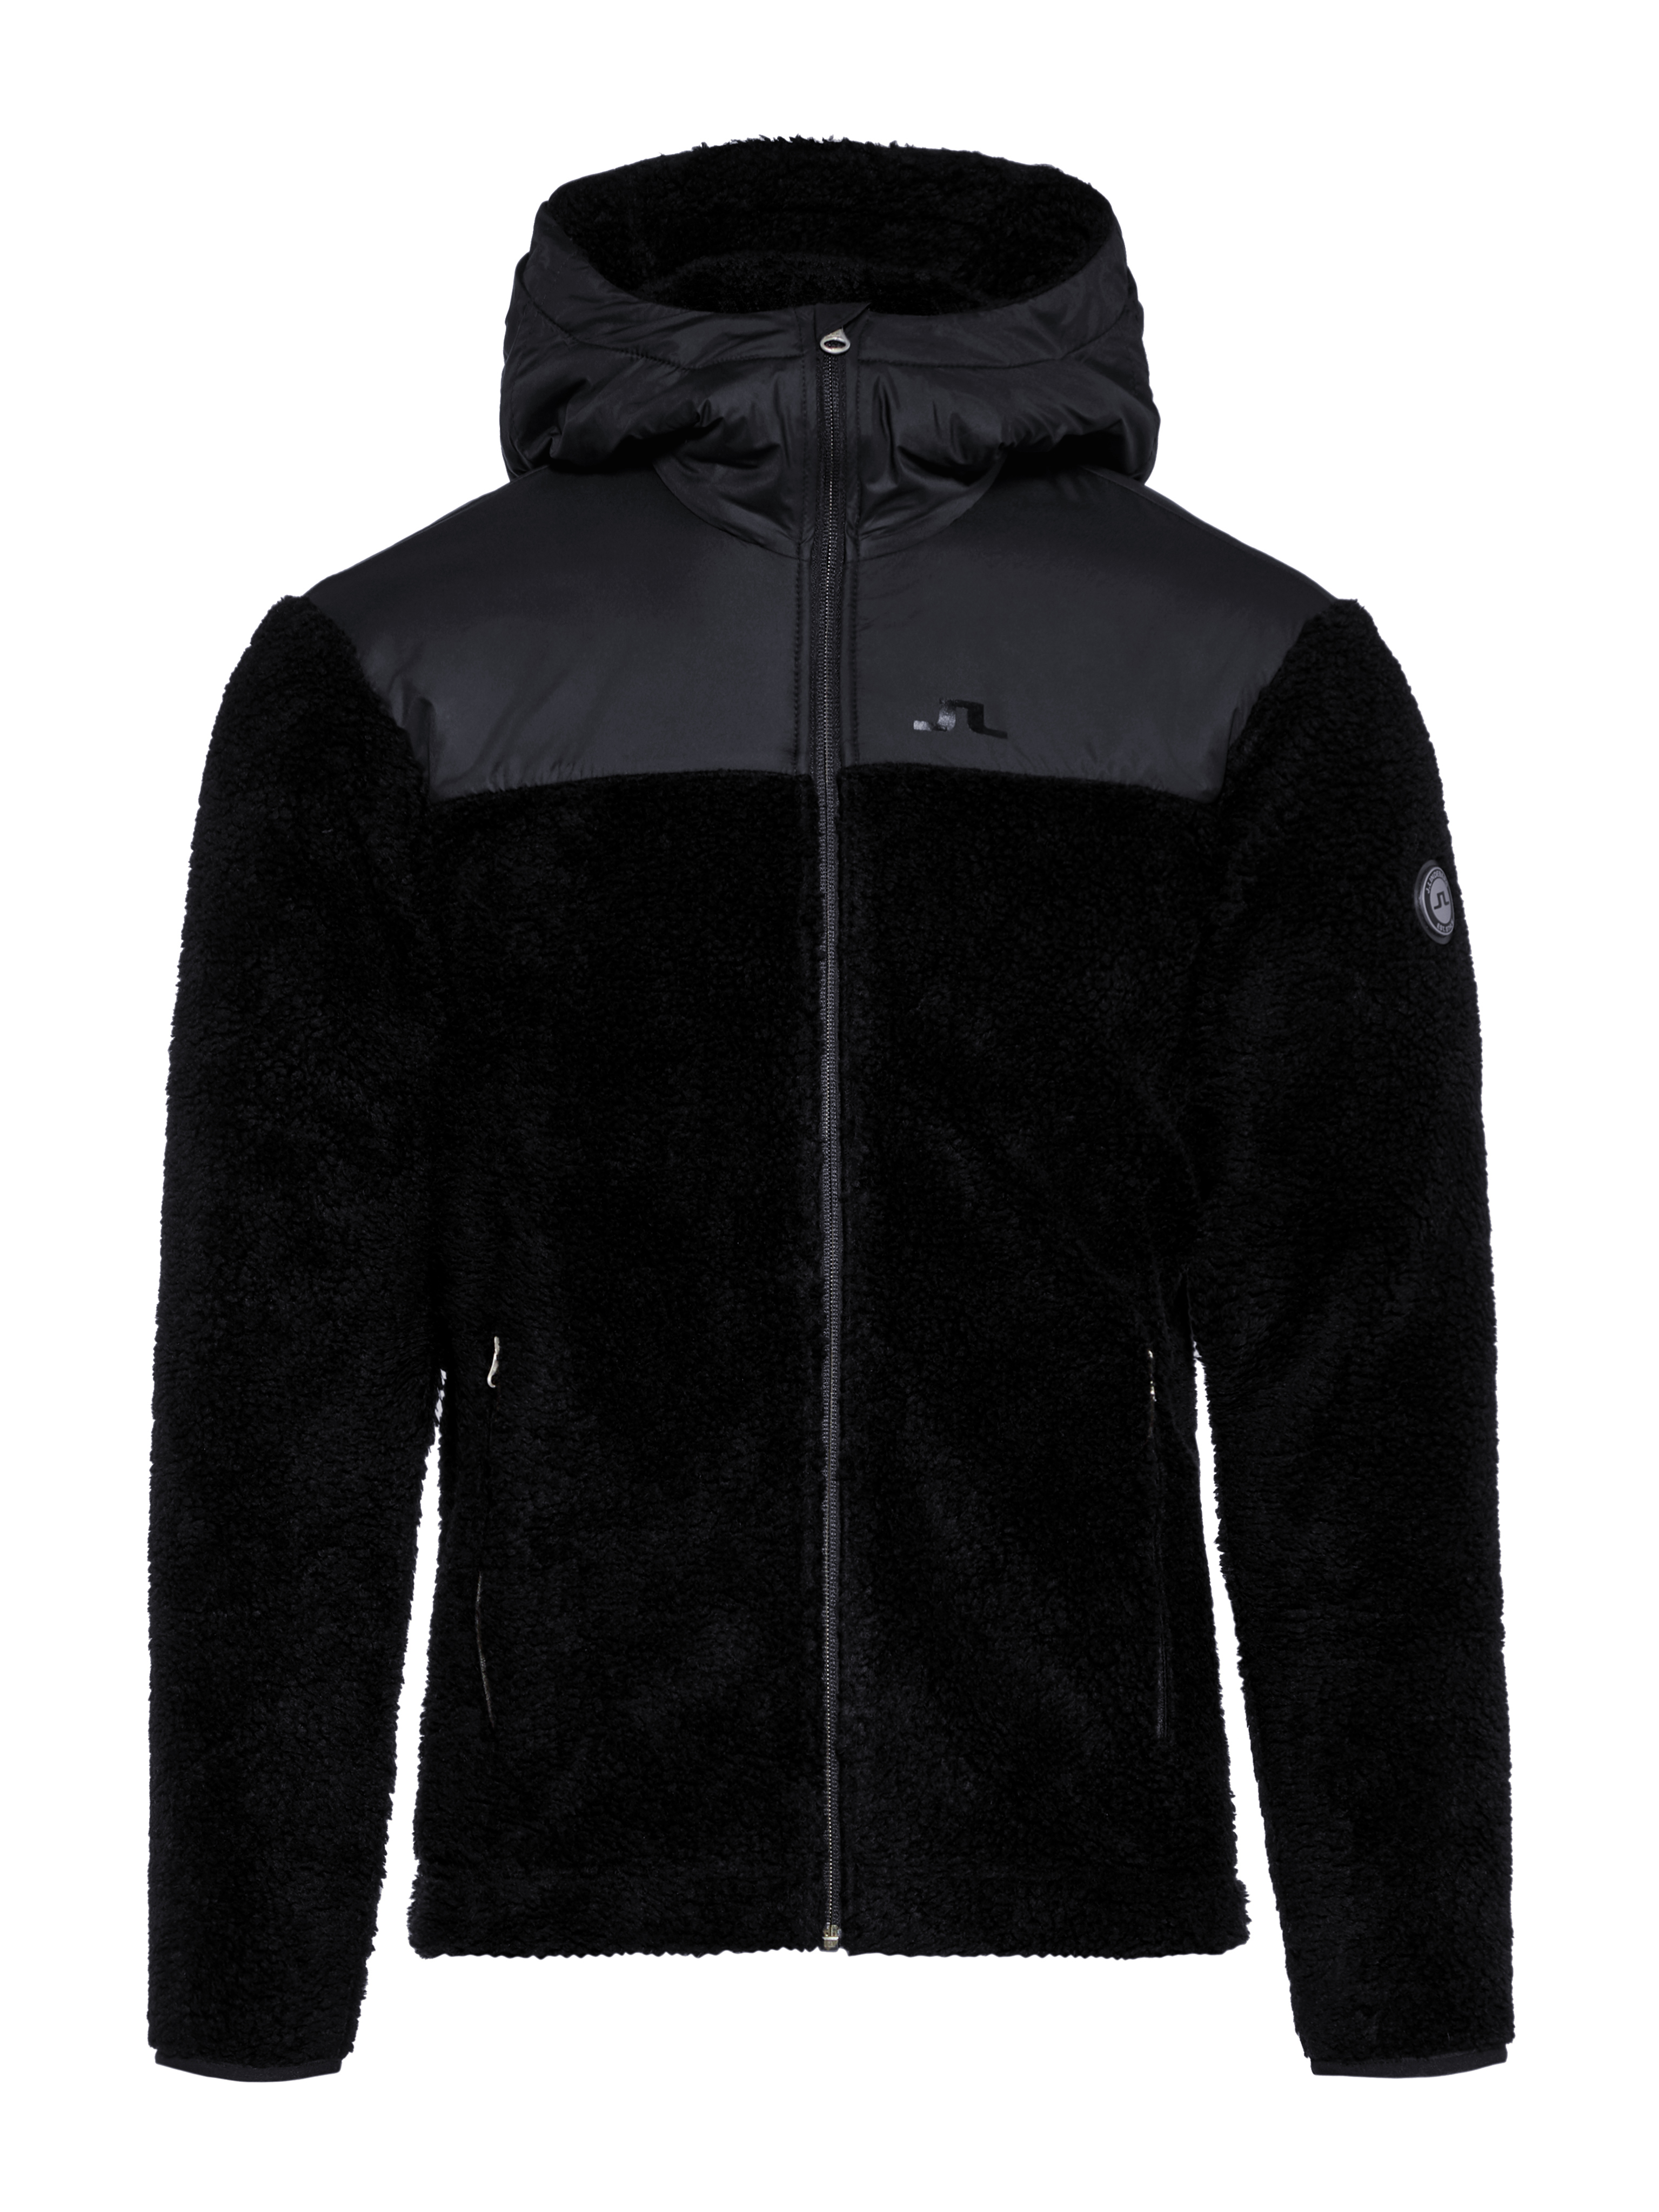 A versatile hoodie for a ski adventure c9670c014827